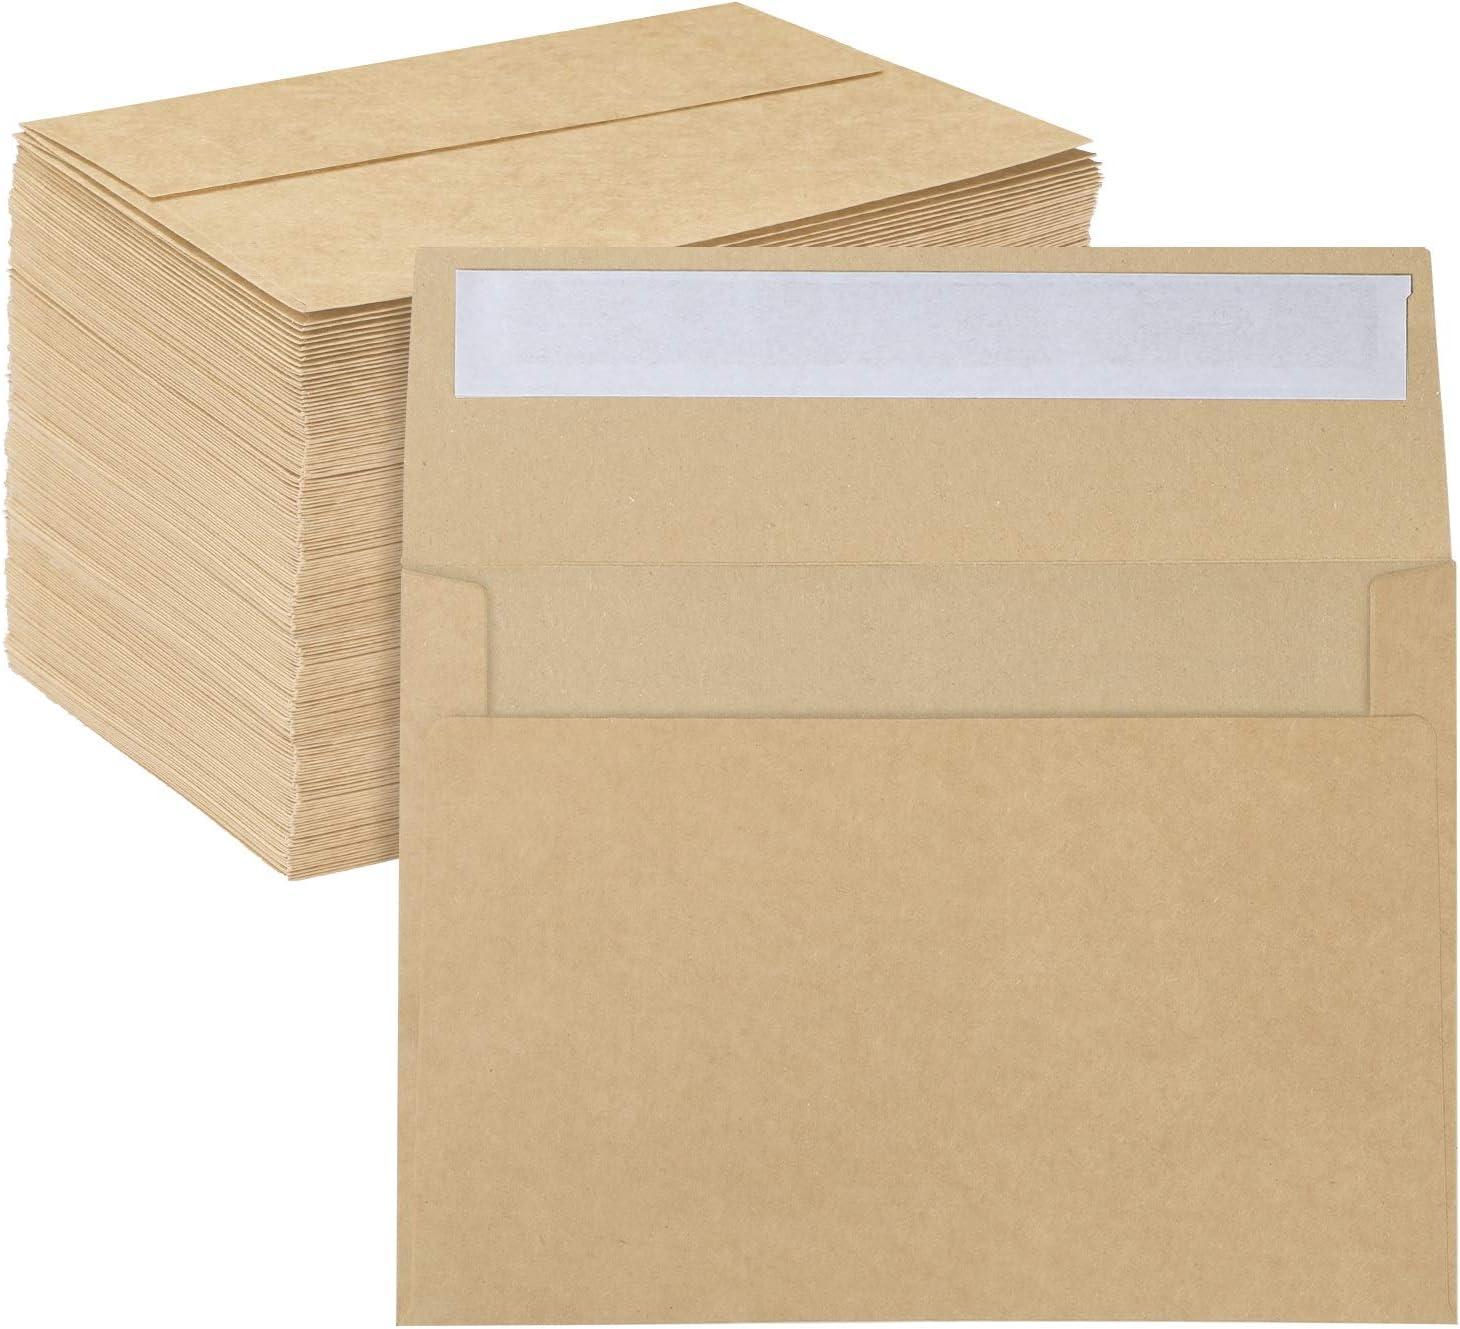 A7 Printable Brown Kraft Envelopes 5x7 Ohuhu 4 Super-cheap 5-1 Pack Boston Mall 150